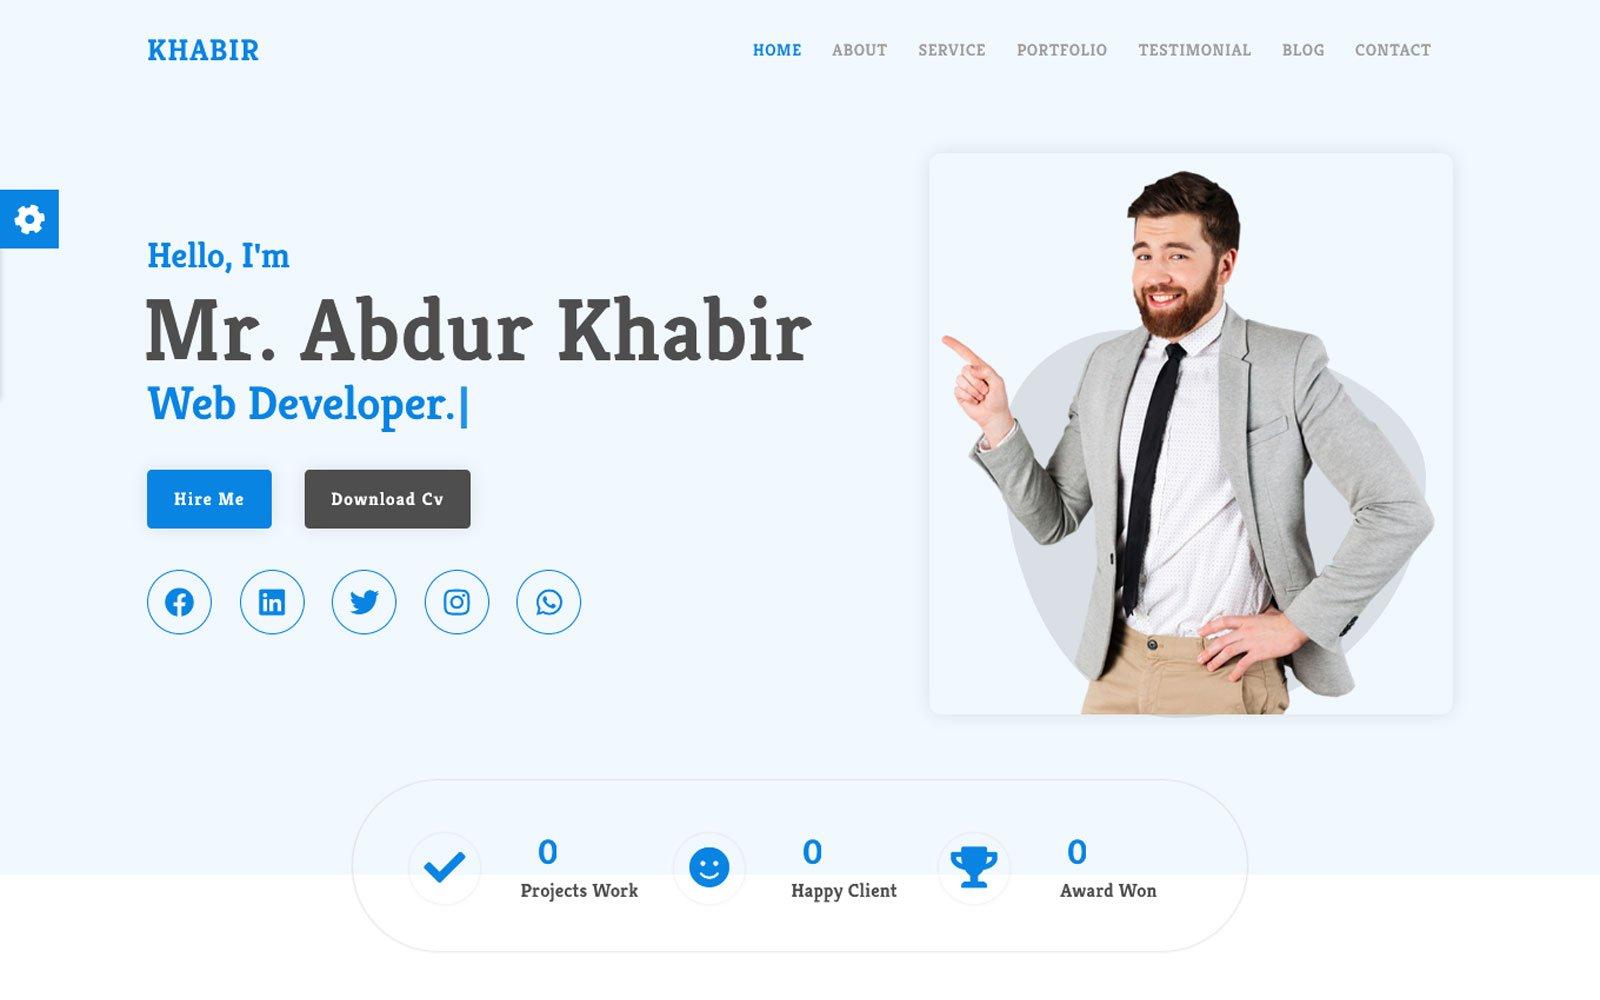 """Al-Khabir - Creative Portfolio CV/Resume"" 响应式着陆页模板 #122887"